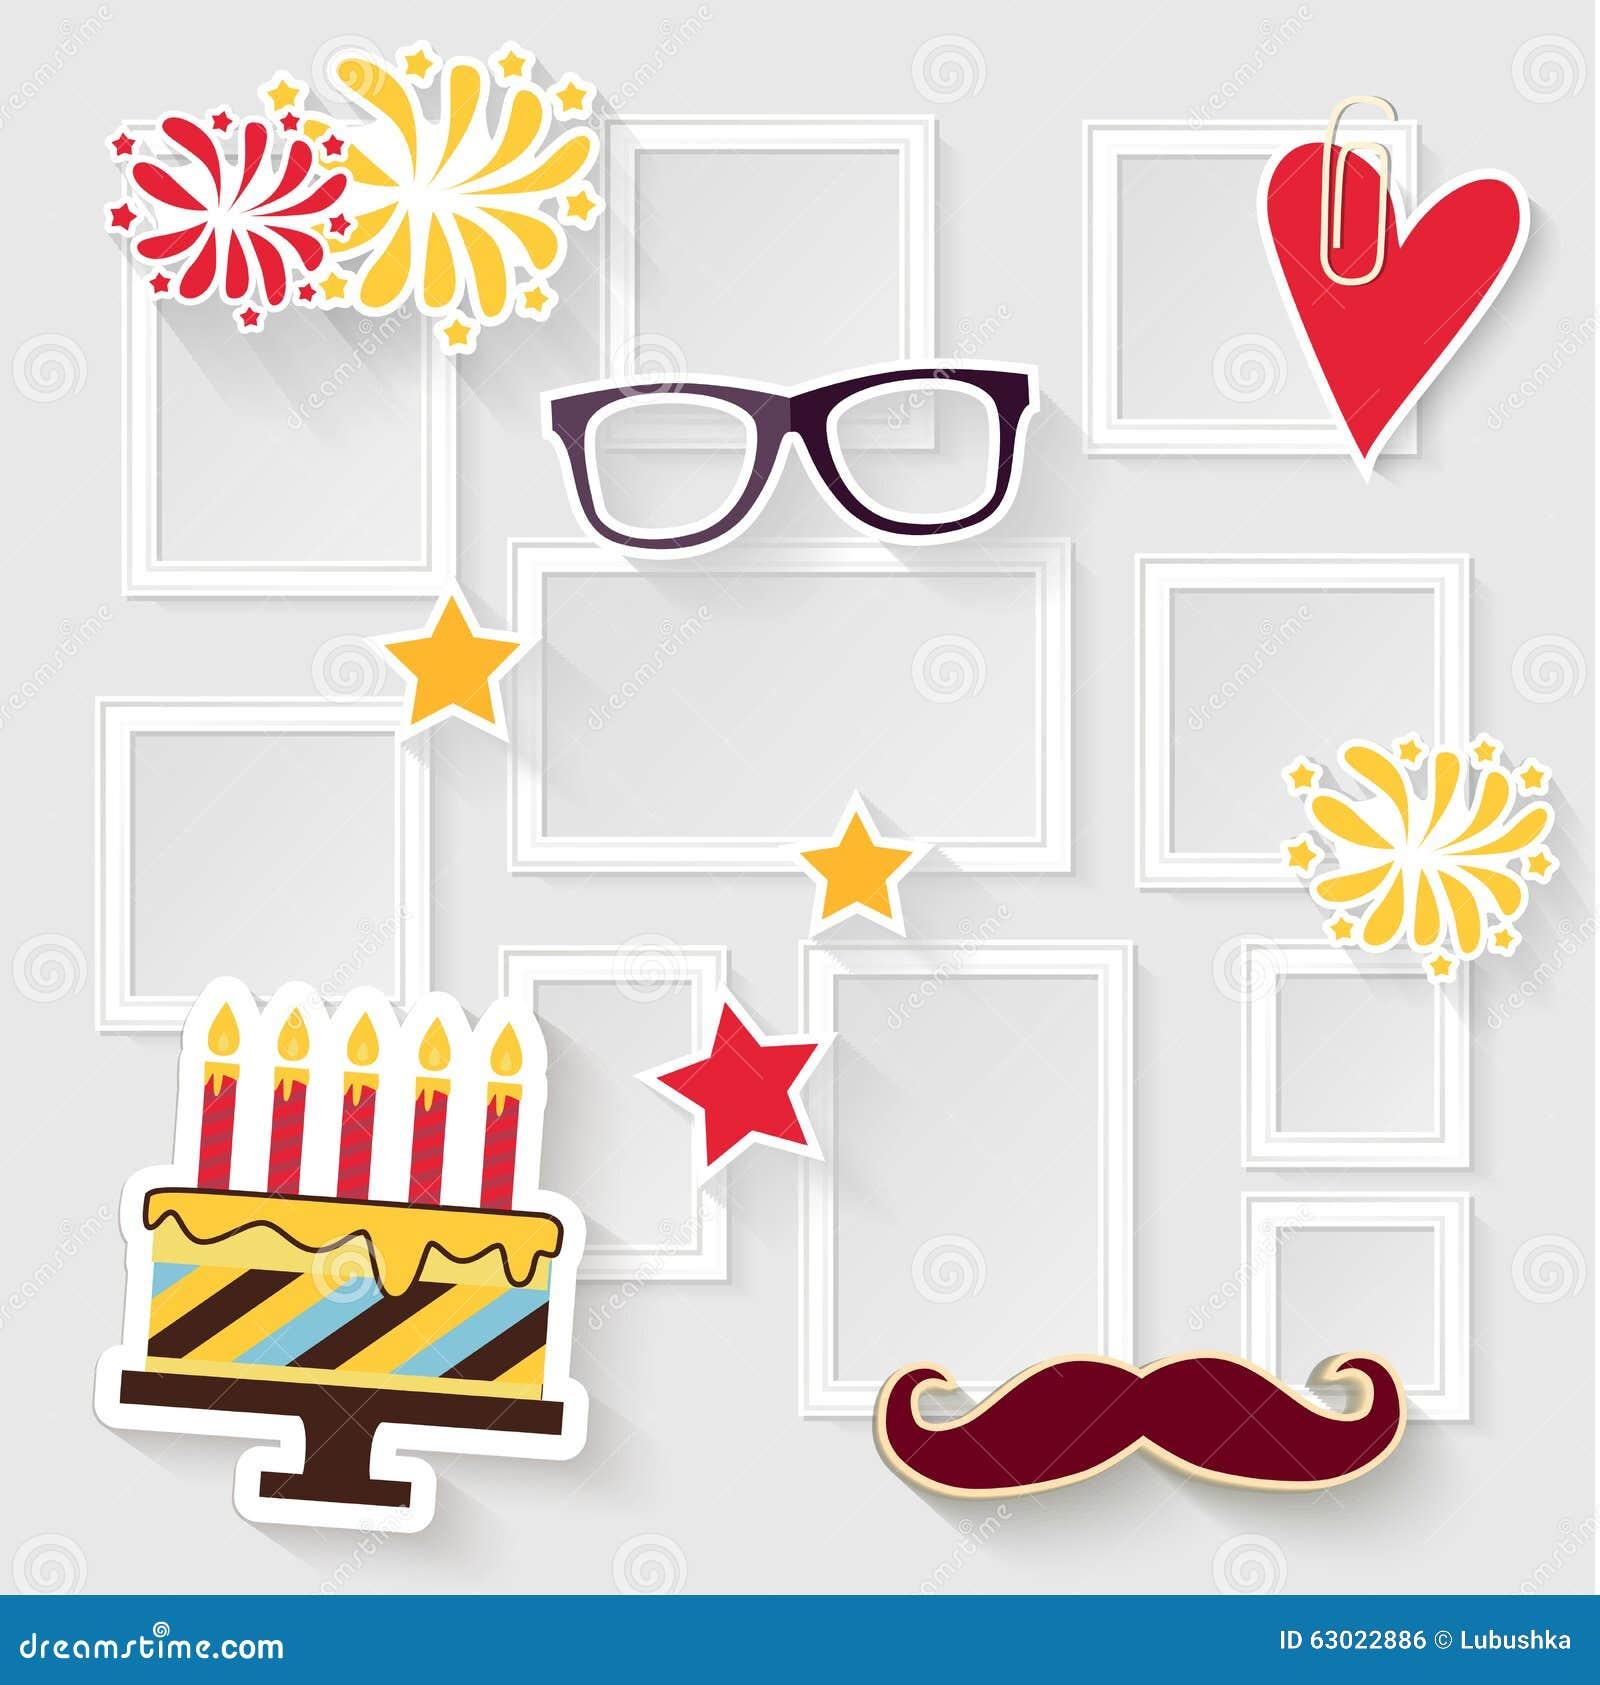 Birthday Photo Frame Stock Vector Image 63022886